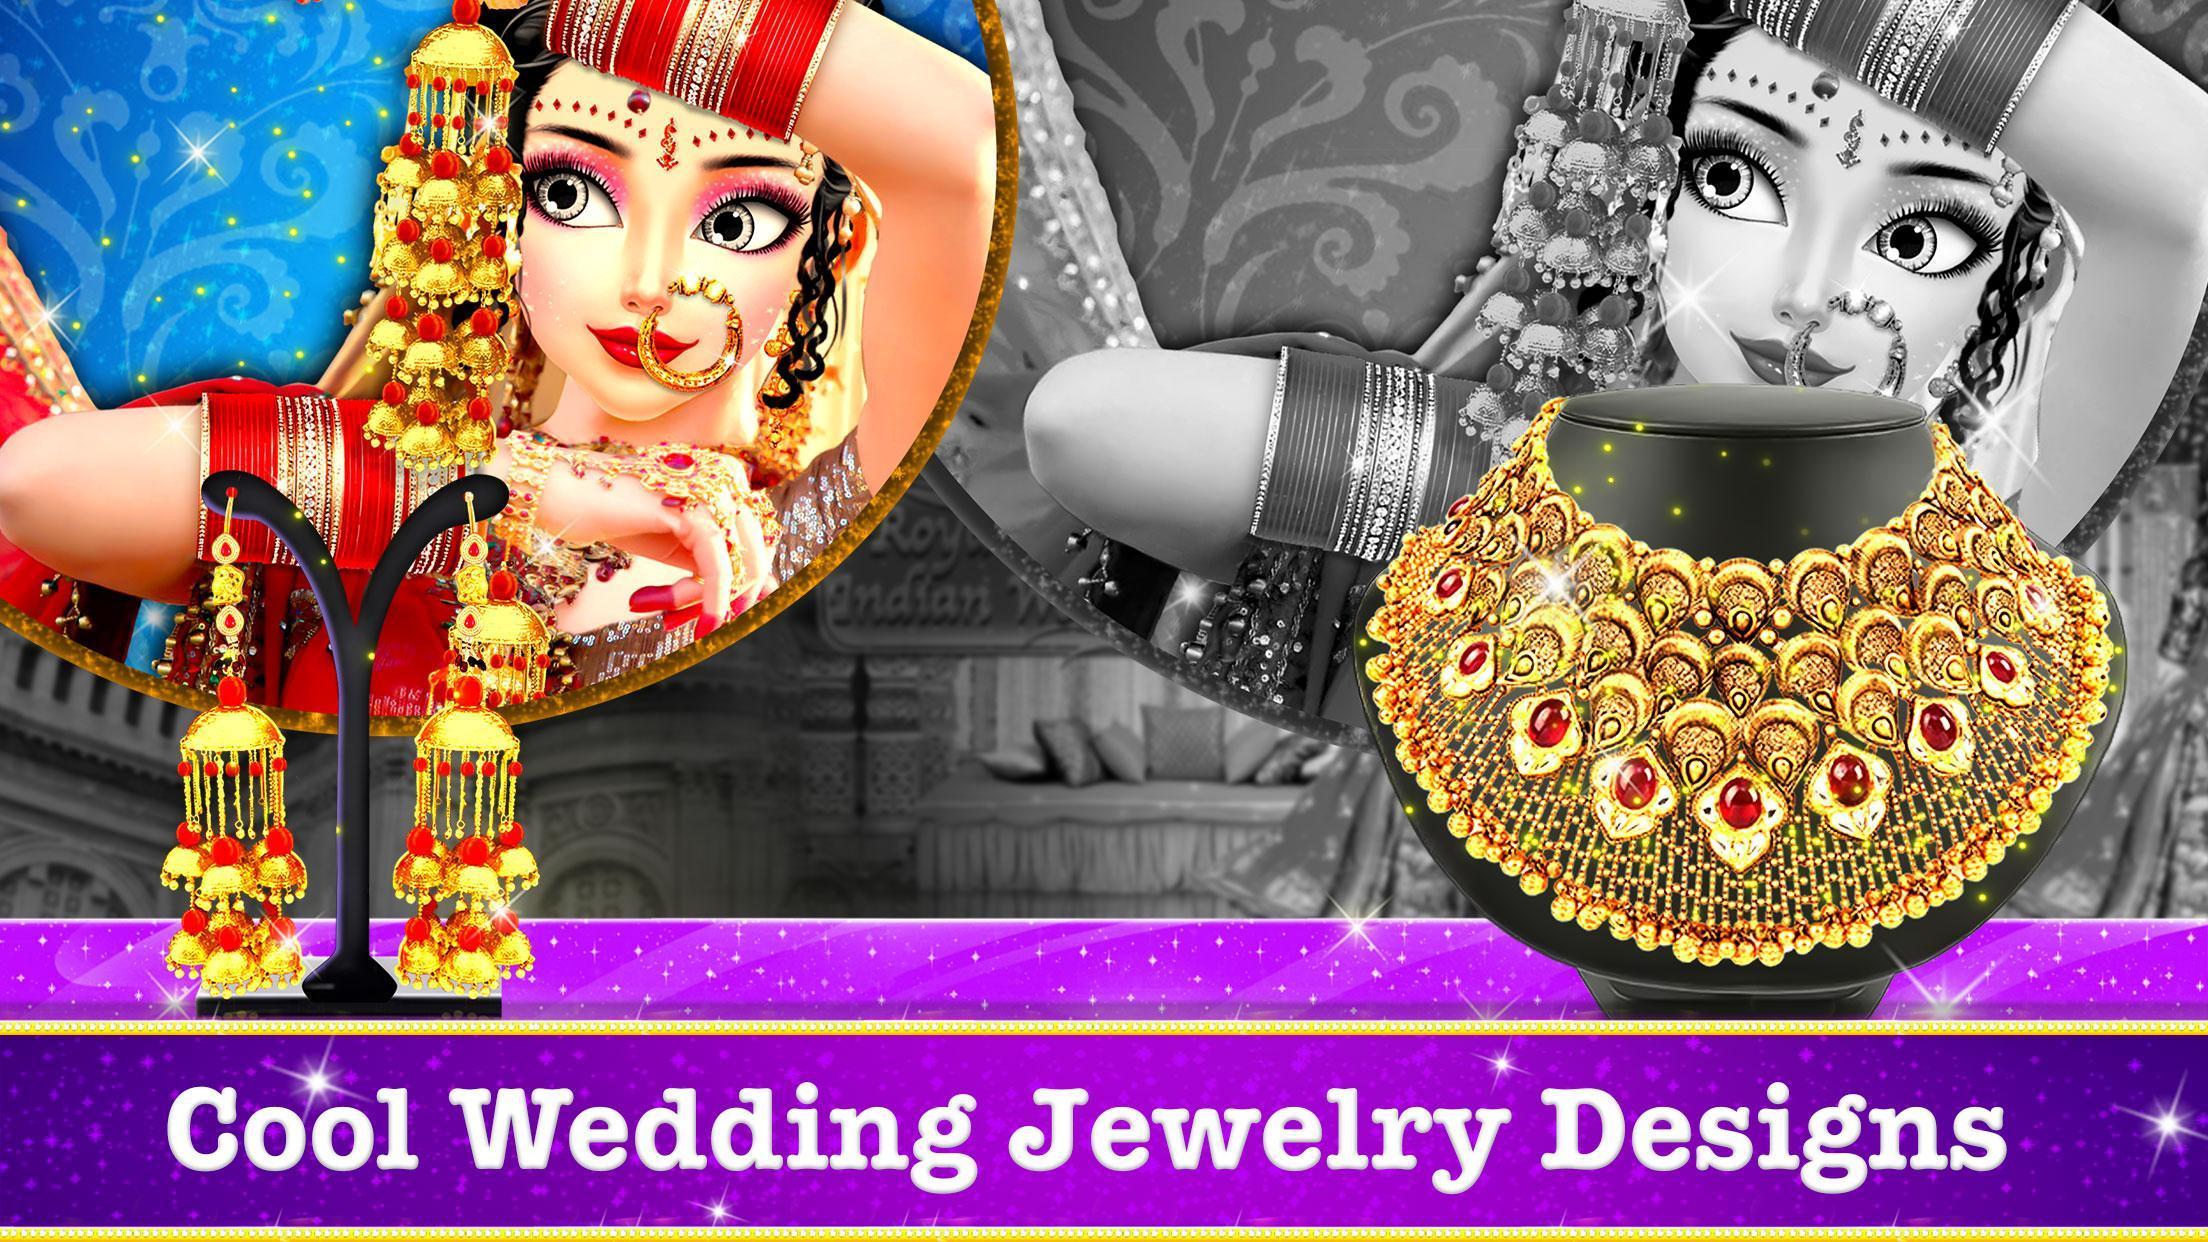 Royal North Indian Wedding Beauty Salon & Handart for Android - APK